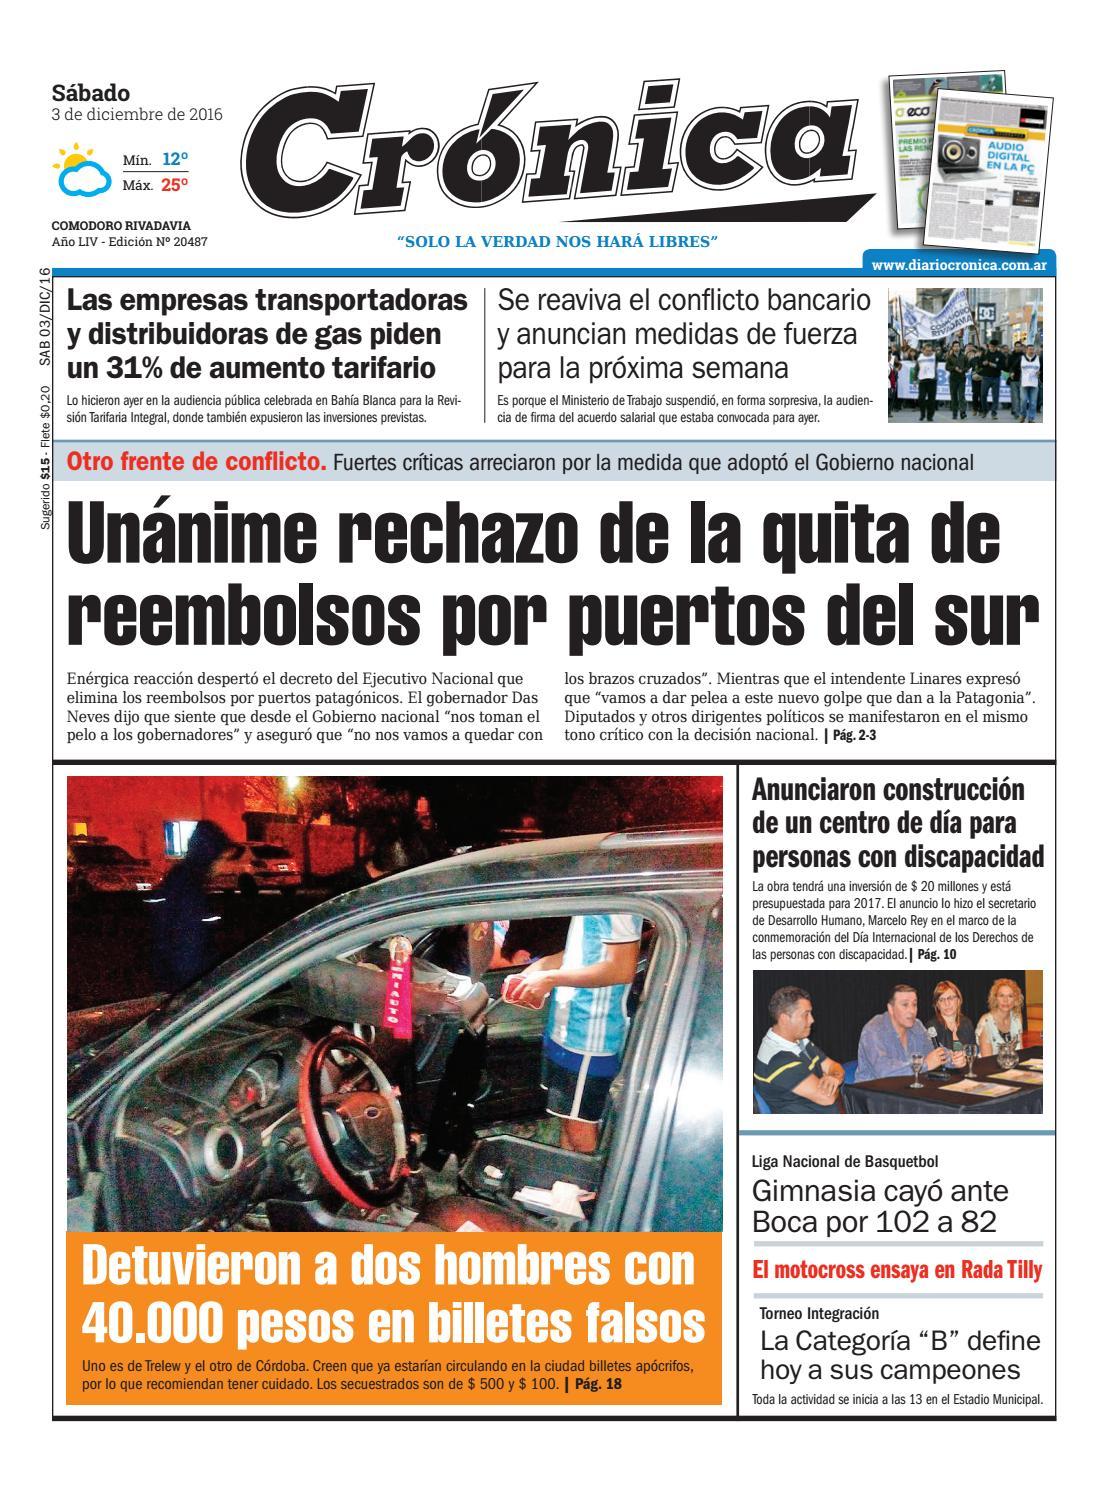 60bf21e089cbddc3bba68d4402e0efc4 by Diario Crónica - issuu